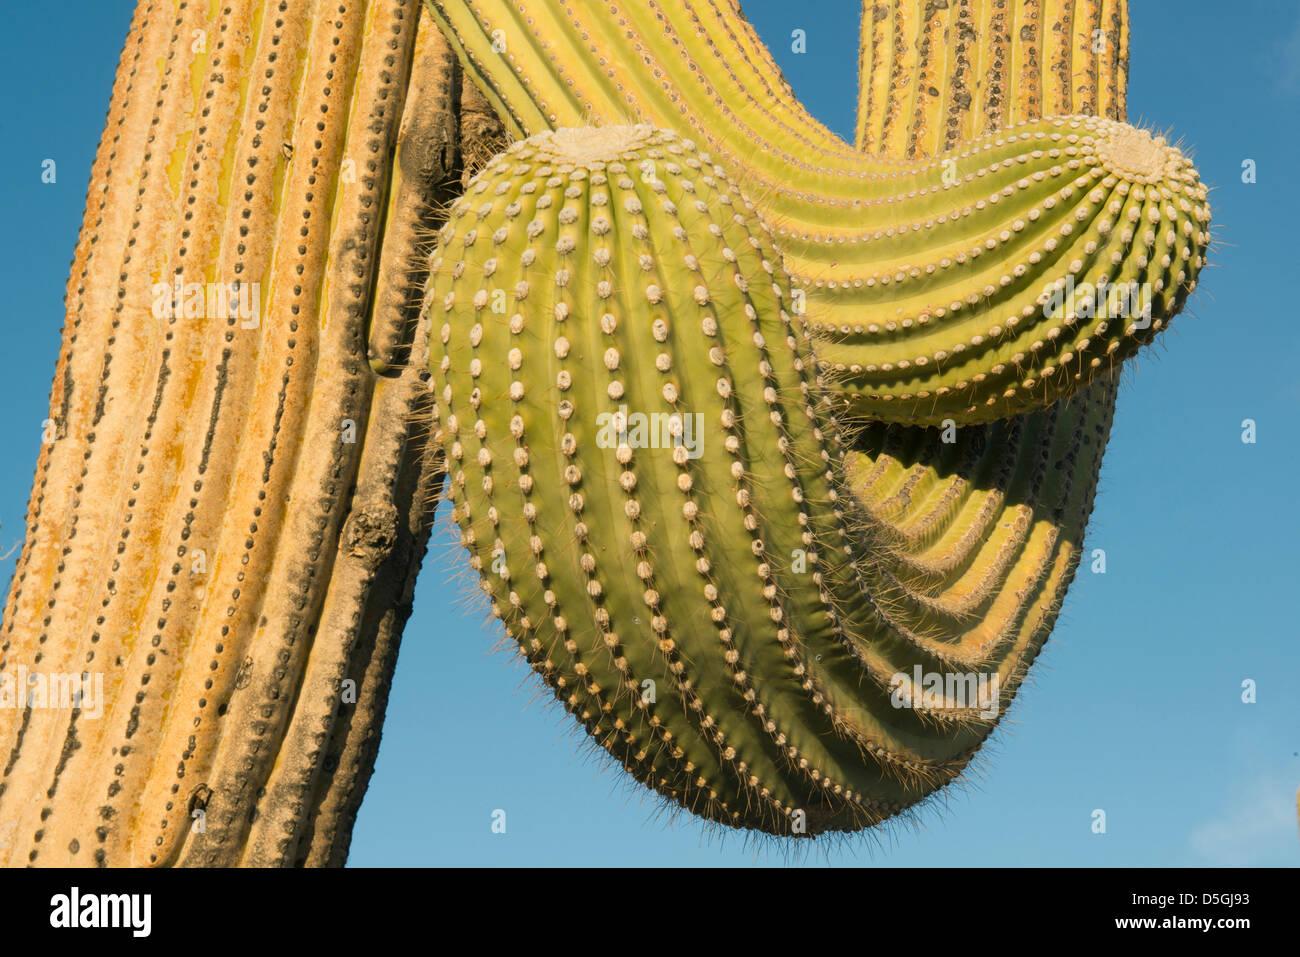 Cacto Saguaro (Carnegiea gigantea) Saguaro National Park, cerca de Tucson, Arizona, EE.UU. Imagen De Stock